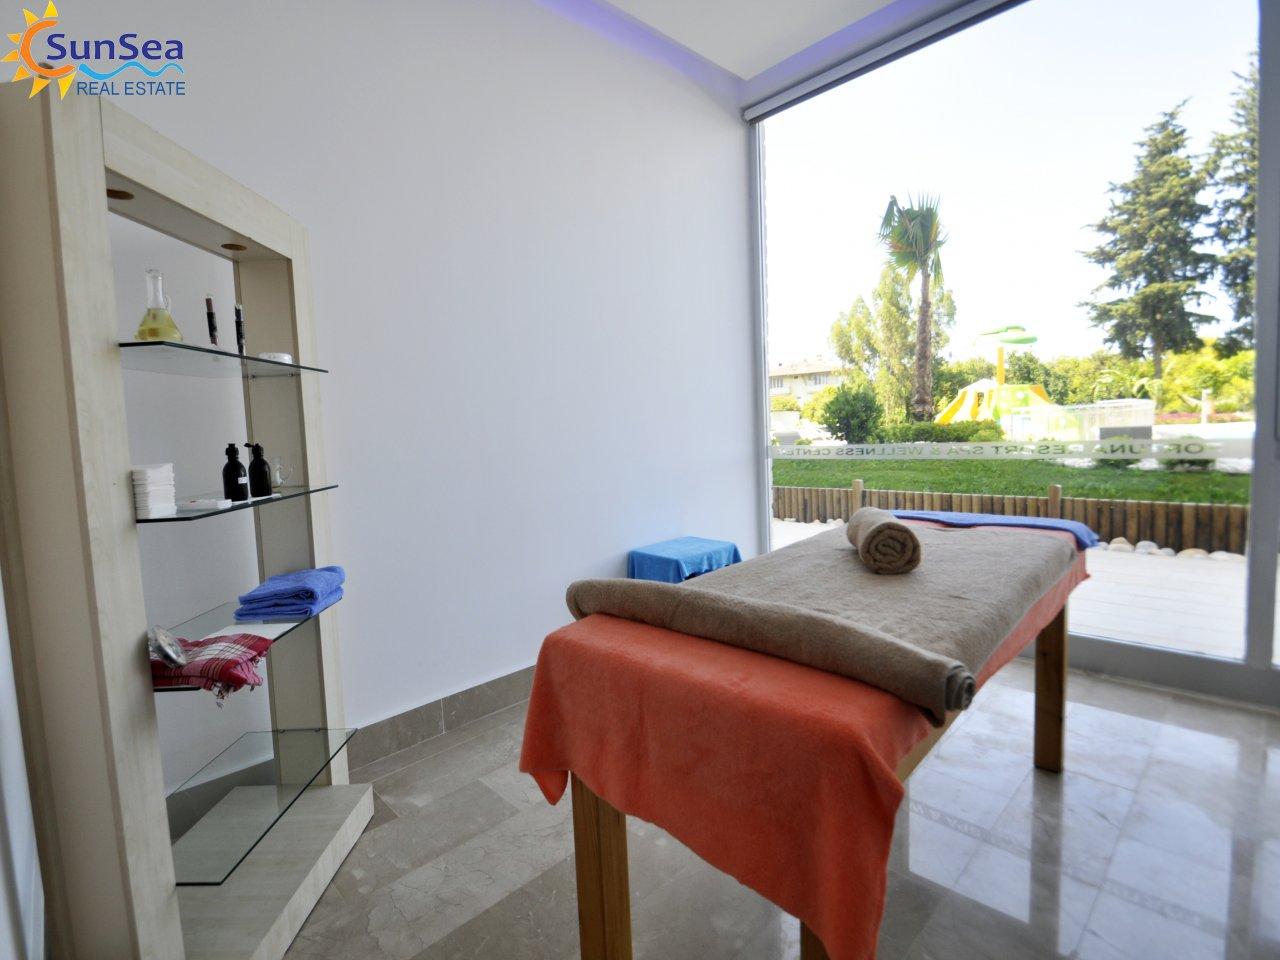 alanya fortuna resort massager